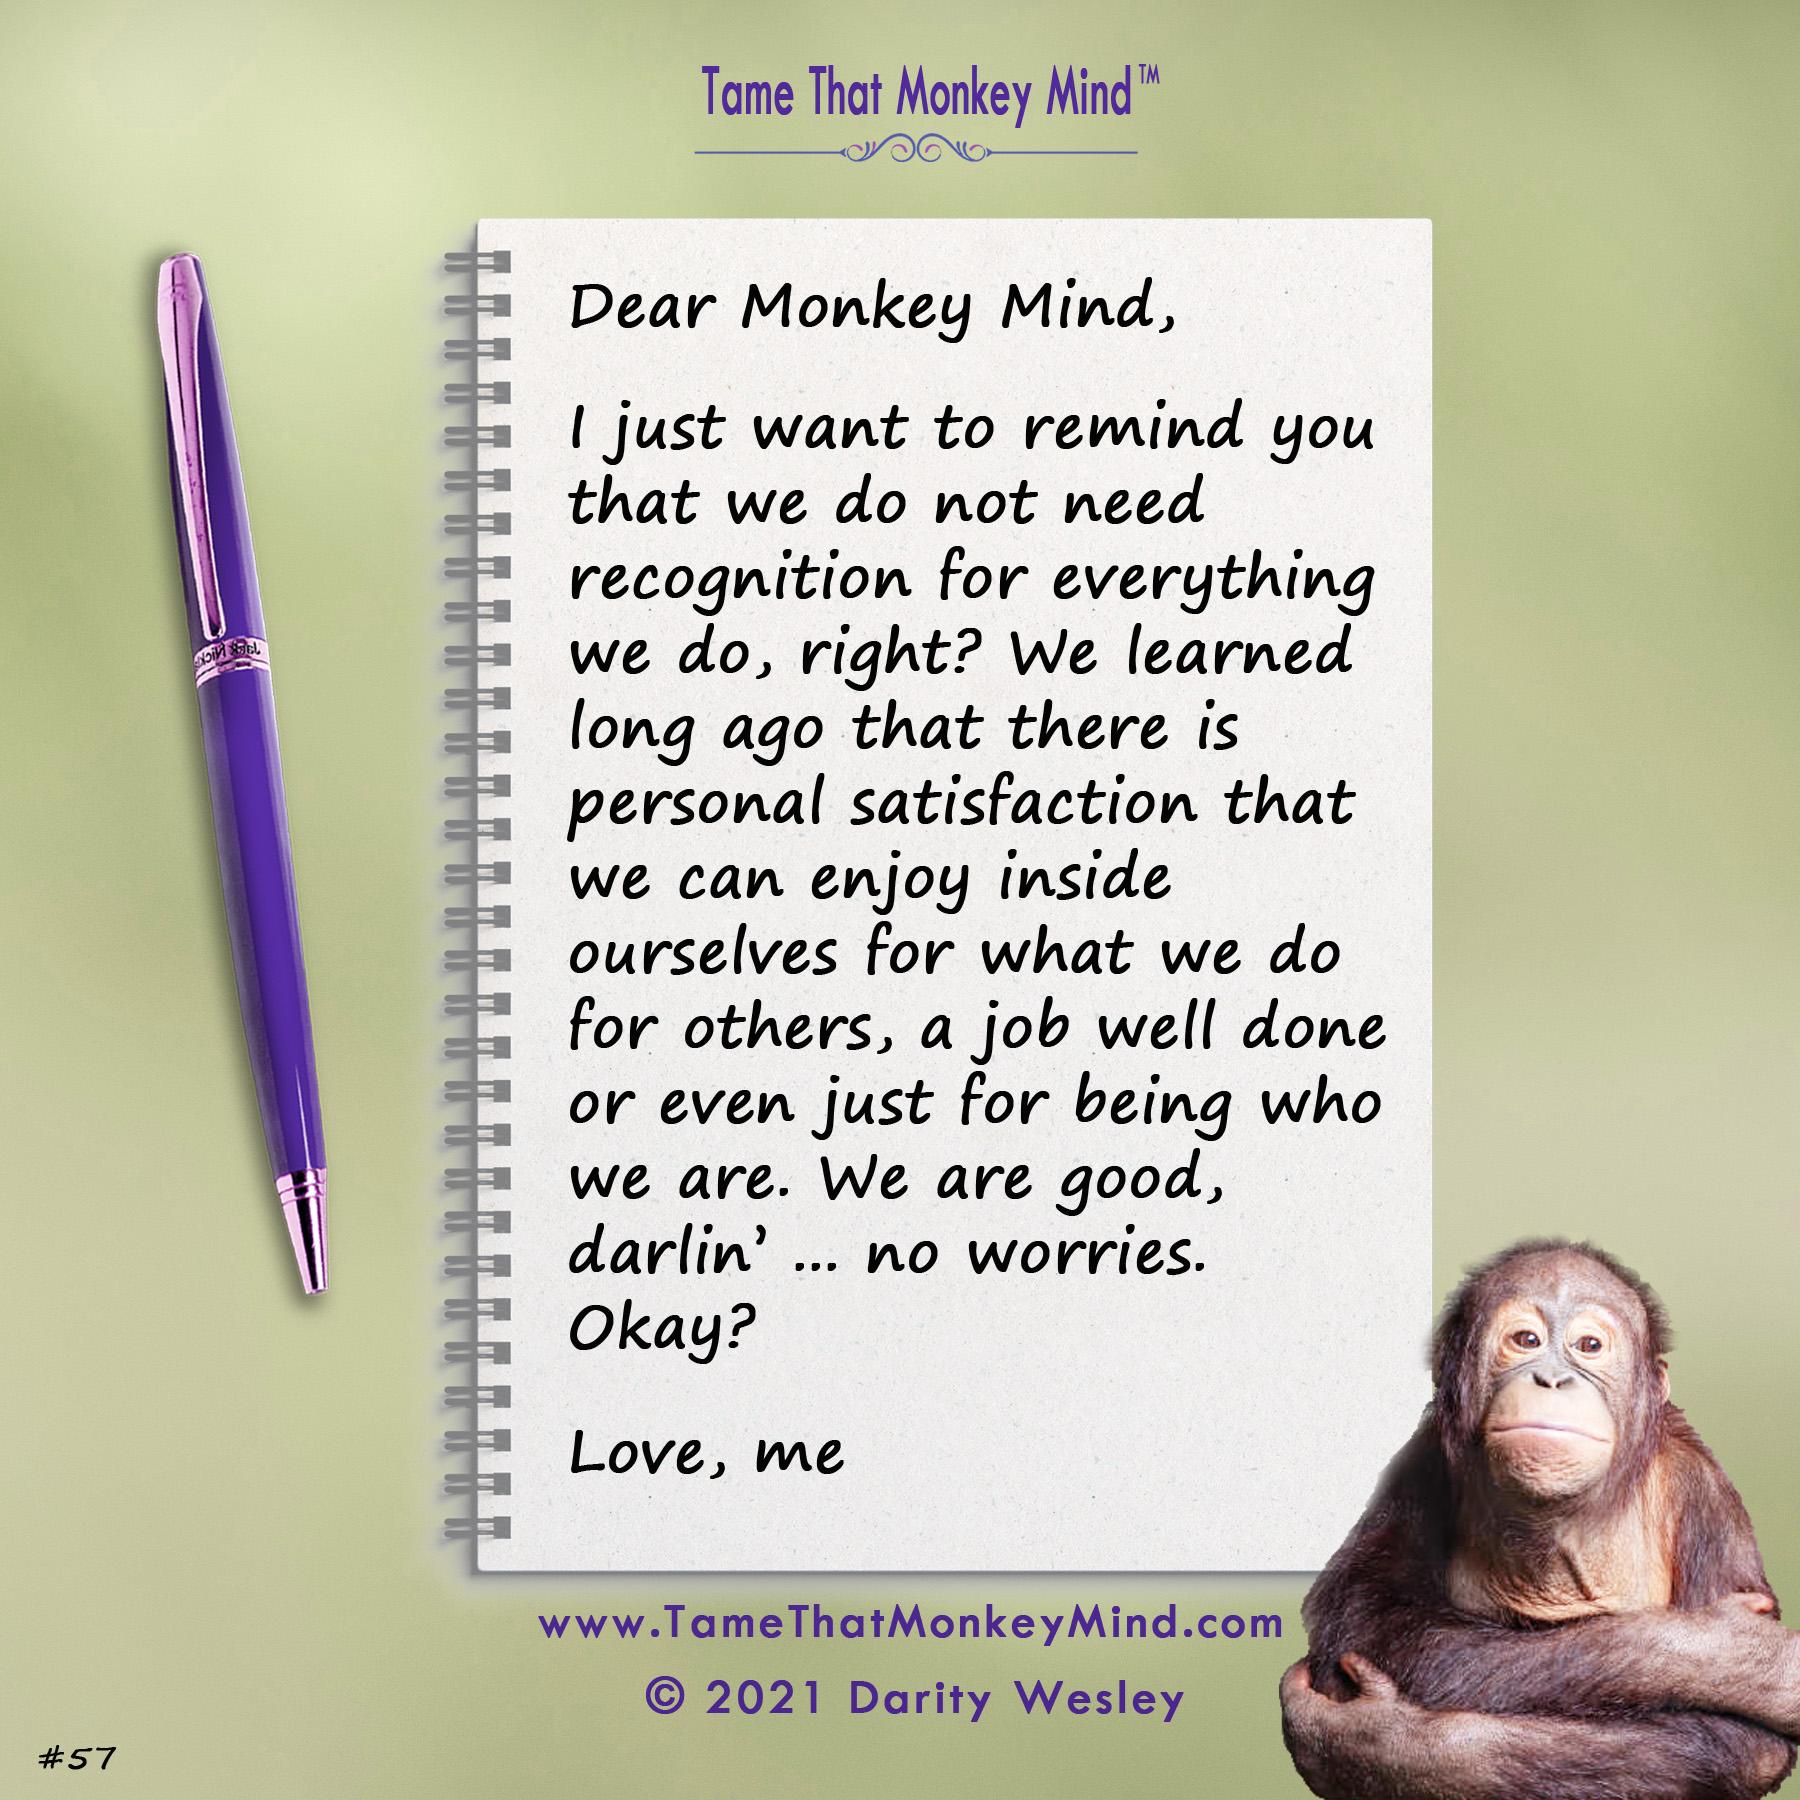 Dear Monkey Mind #57